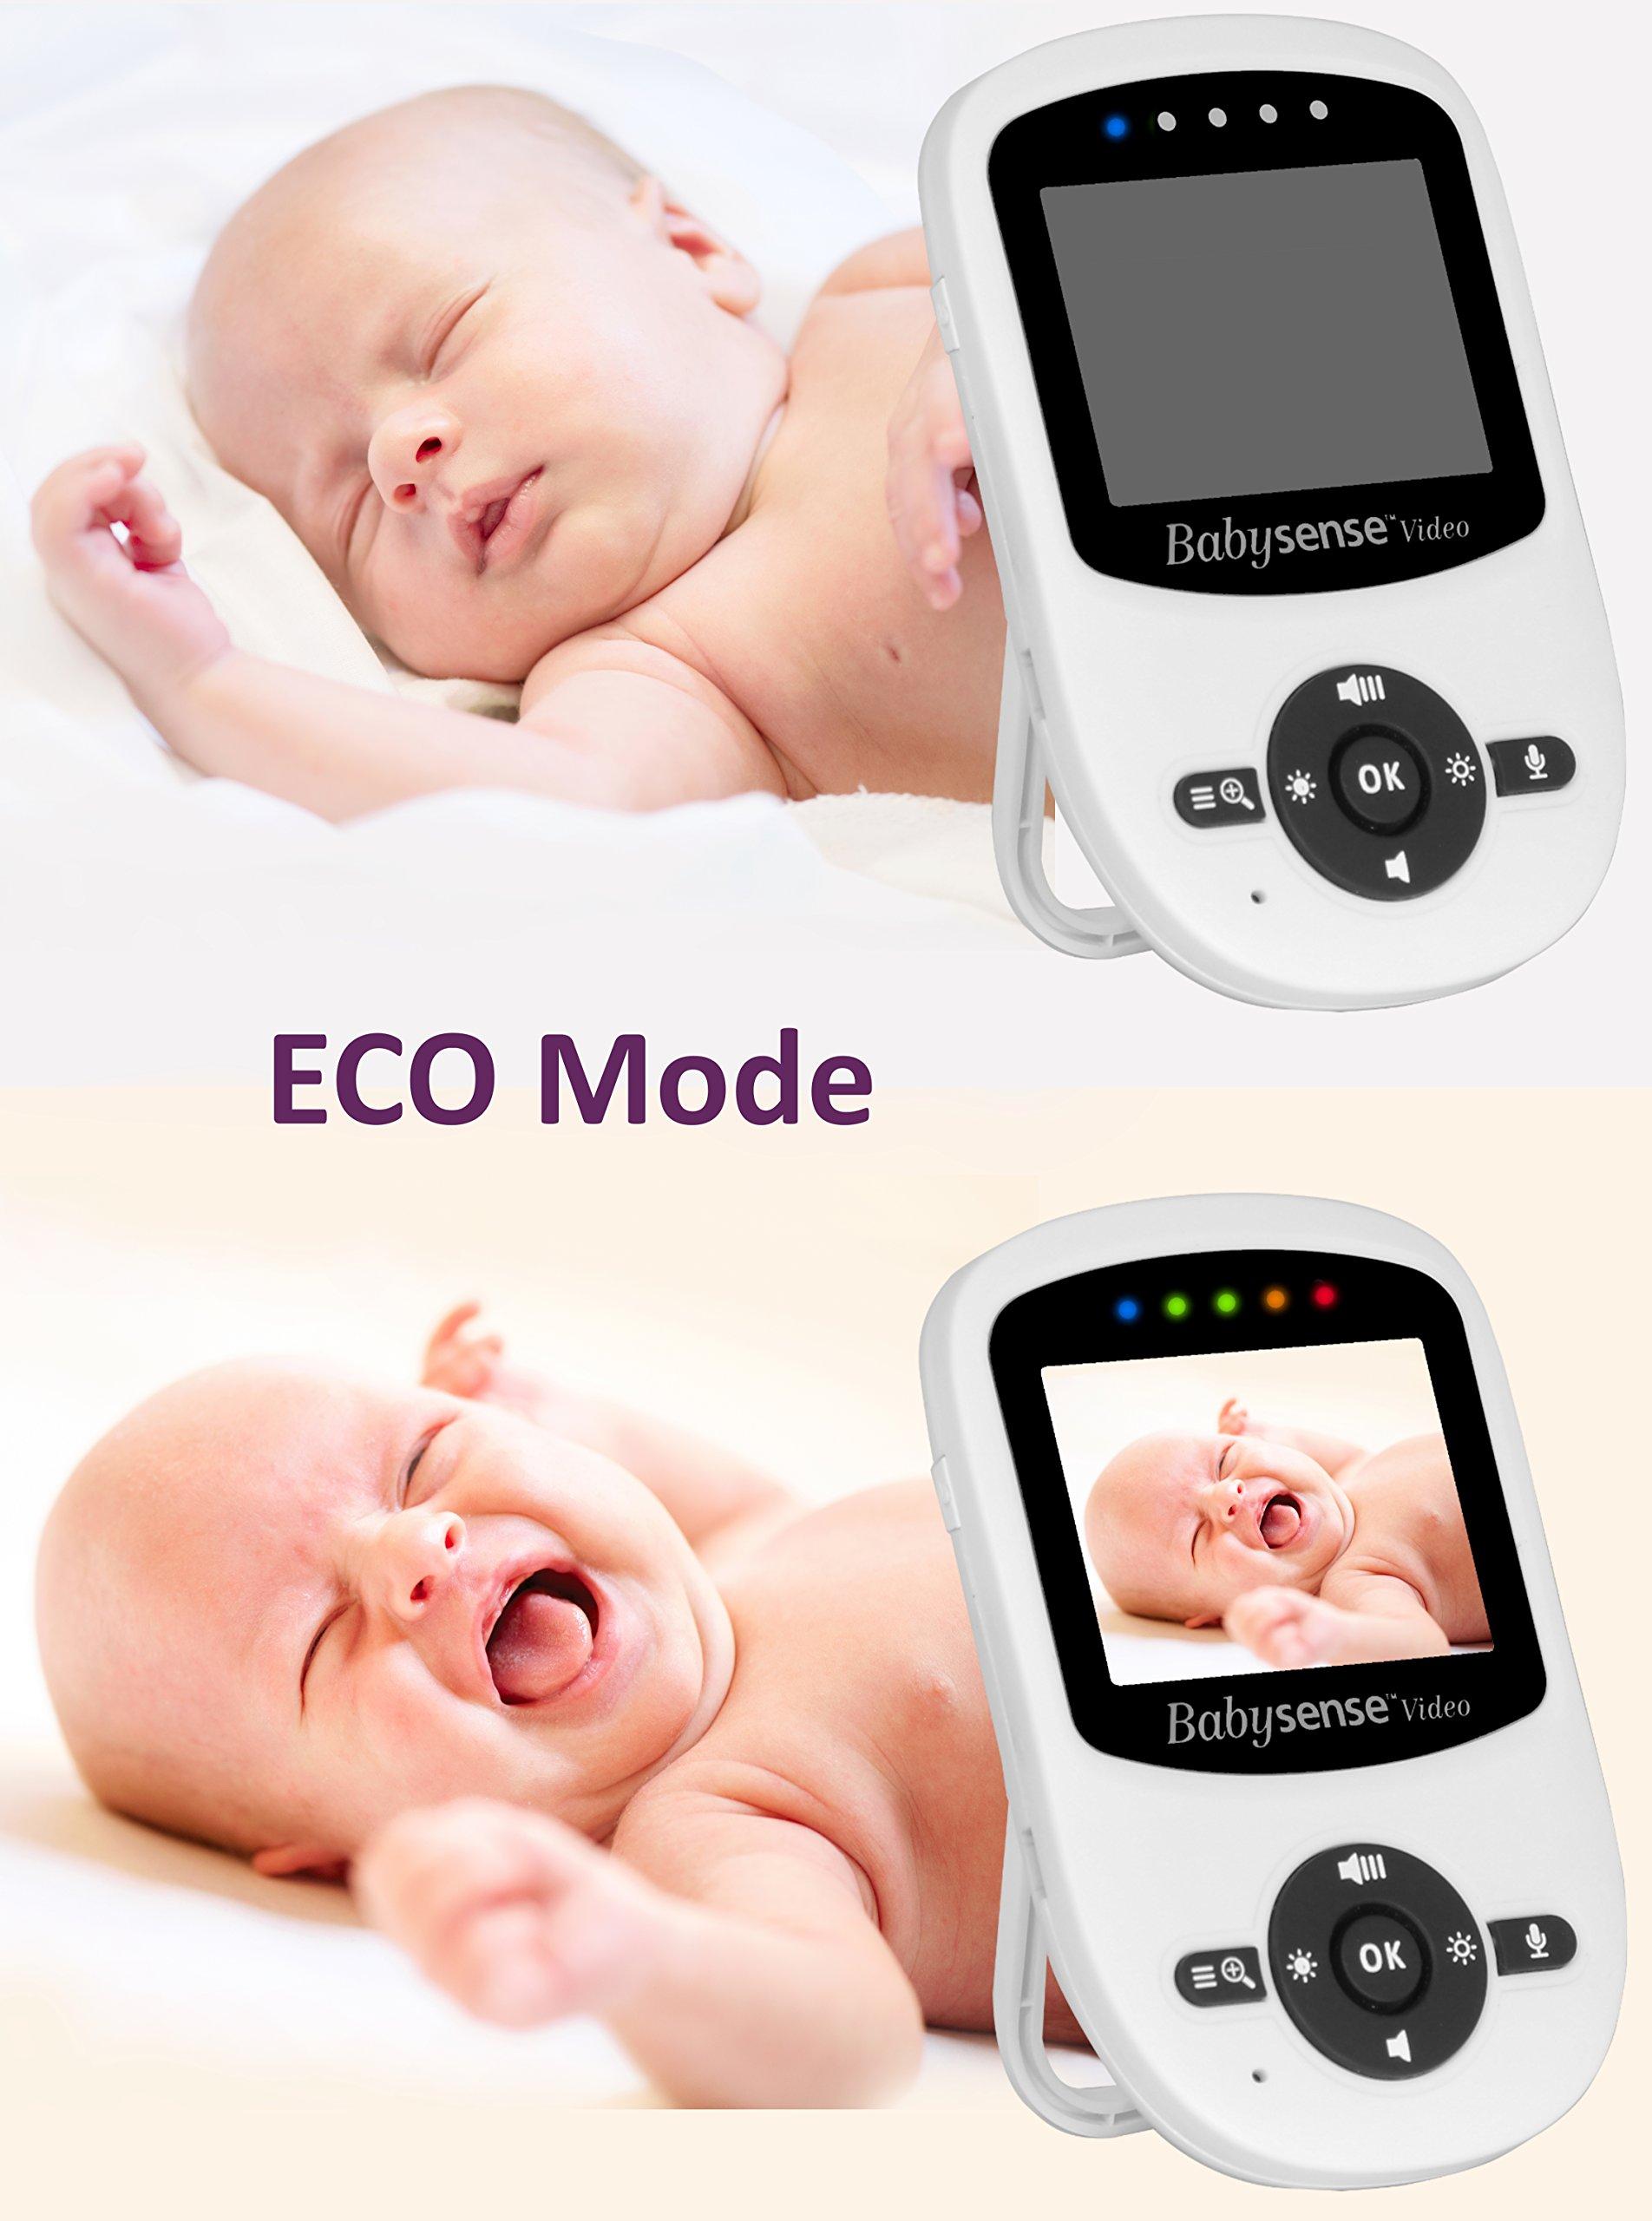 New Model: Babysense Video + Baby Movement Monitor - Bundle Pack: Babysense Video Baby Monitor with Babysense 7 Under-The-Mattress Baby Movement Monitor - 2 in 1 by Babysense (Image #6)